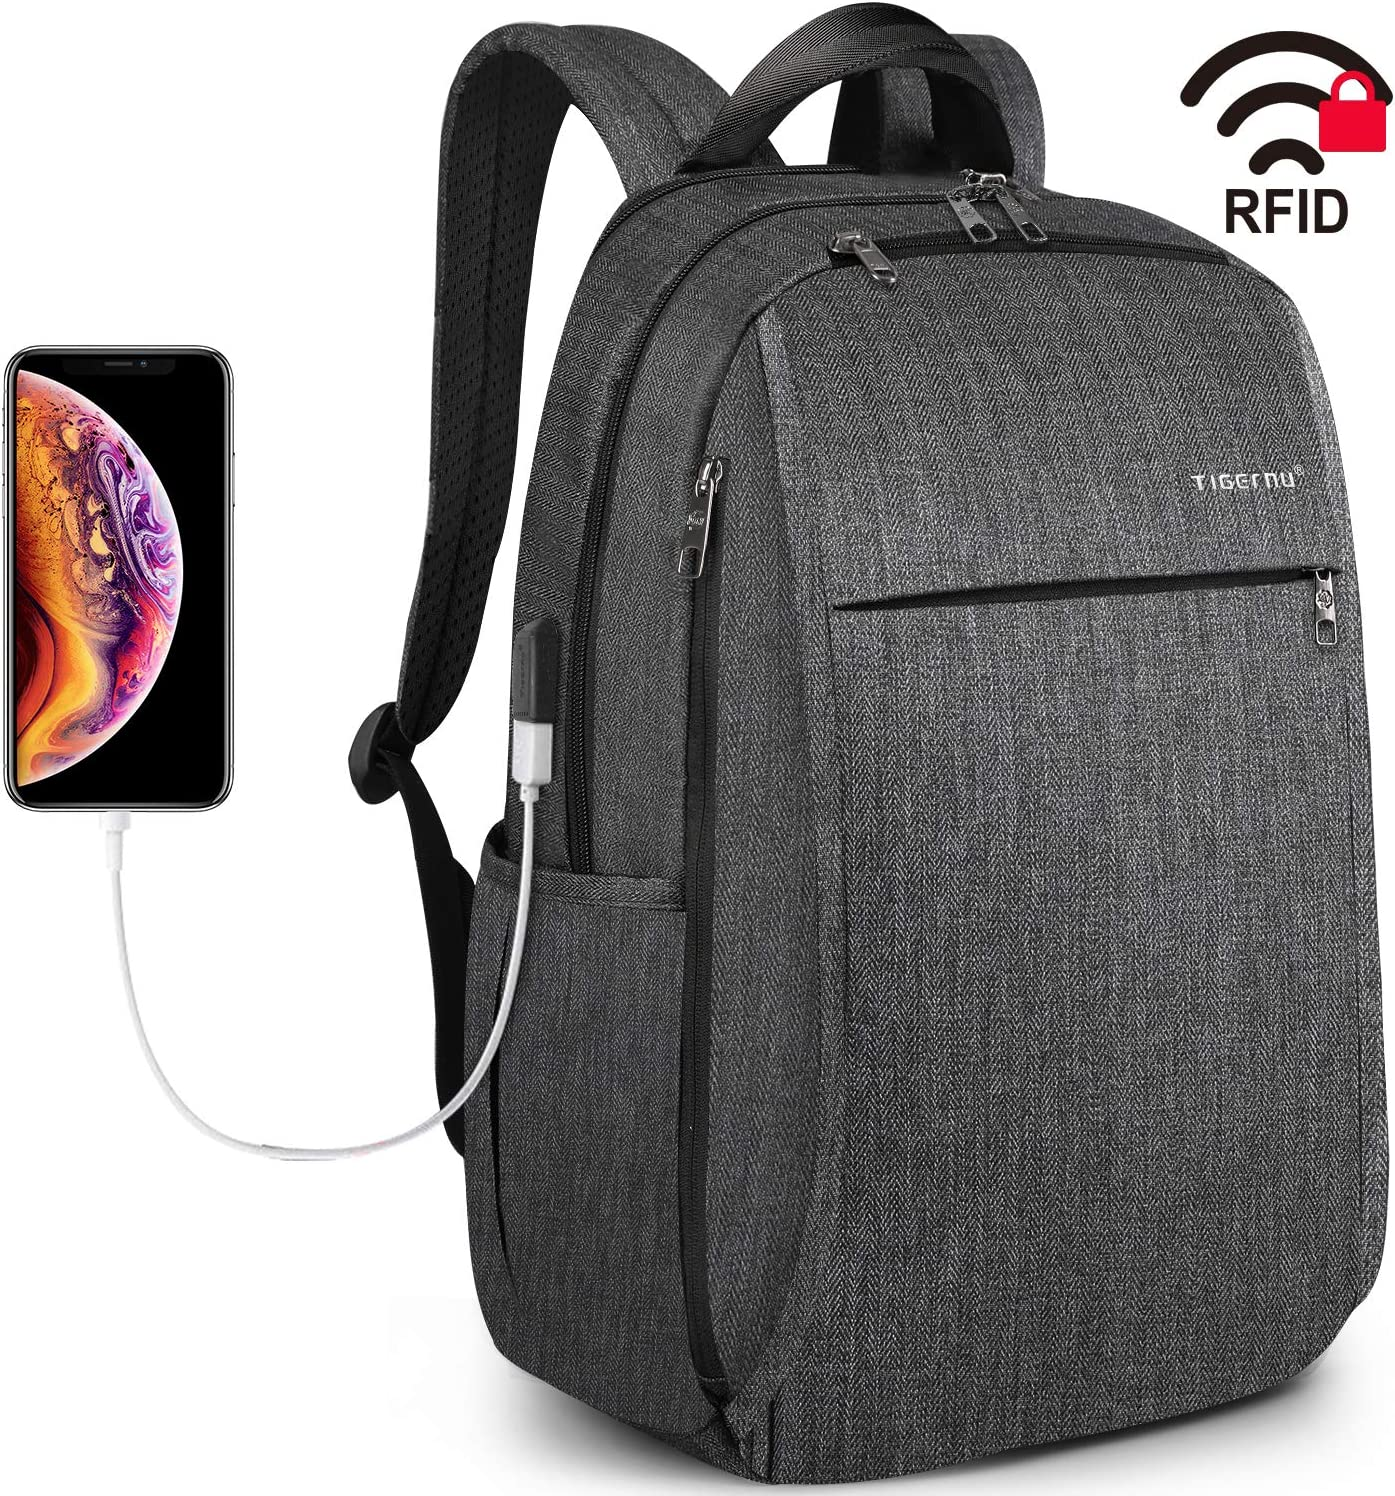 Tigernu Travel Laptop Backpack School Backpacks with USB Charging Port Business RFID Safe Computer Bag Water Resistant Bookbag for College Office Daypacks Men Women fit 15.6 Inch Macbook